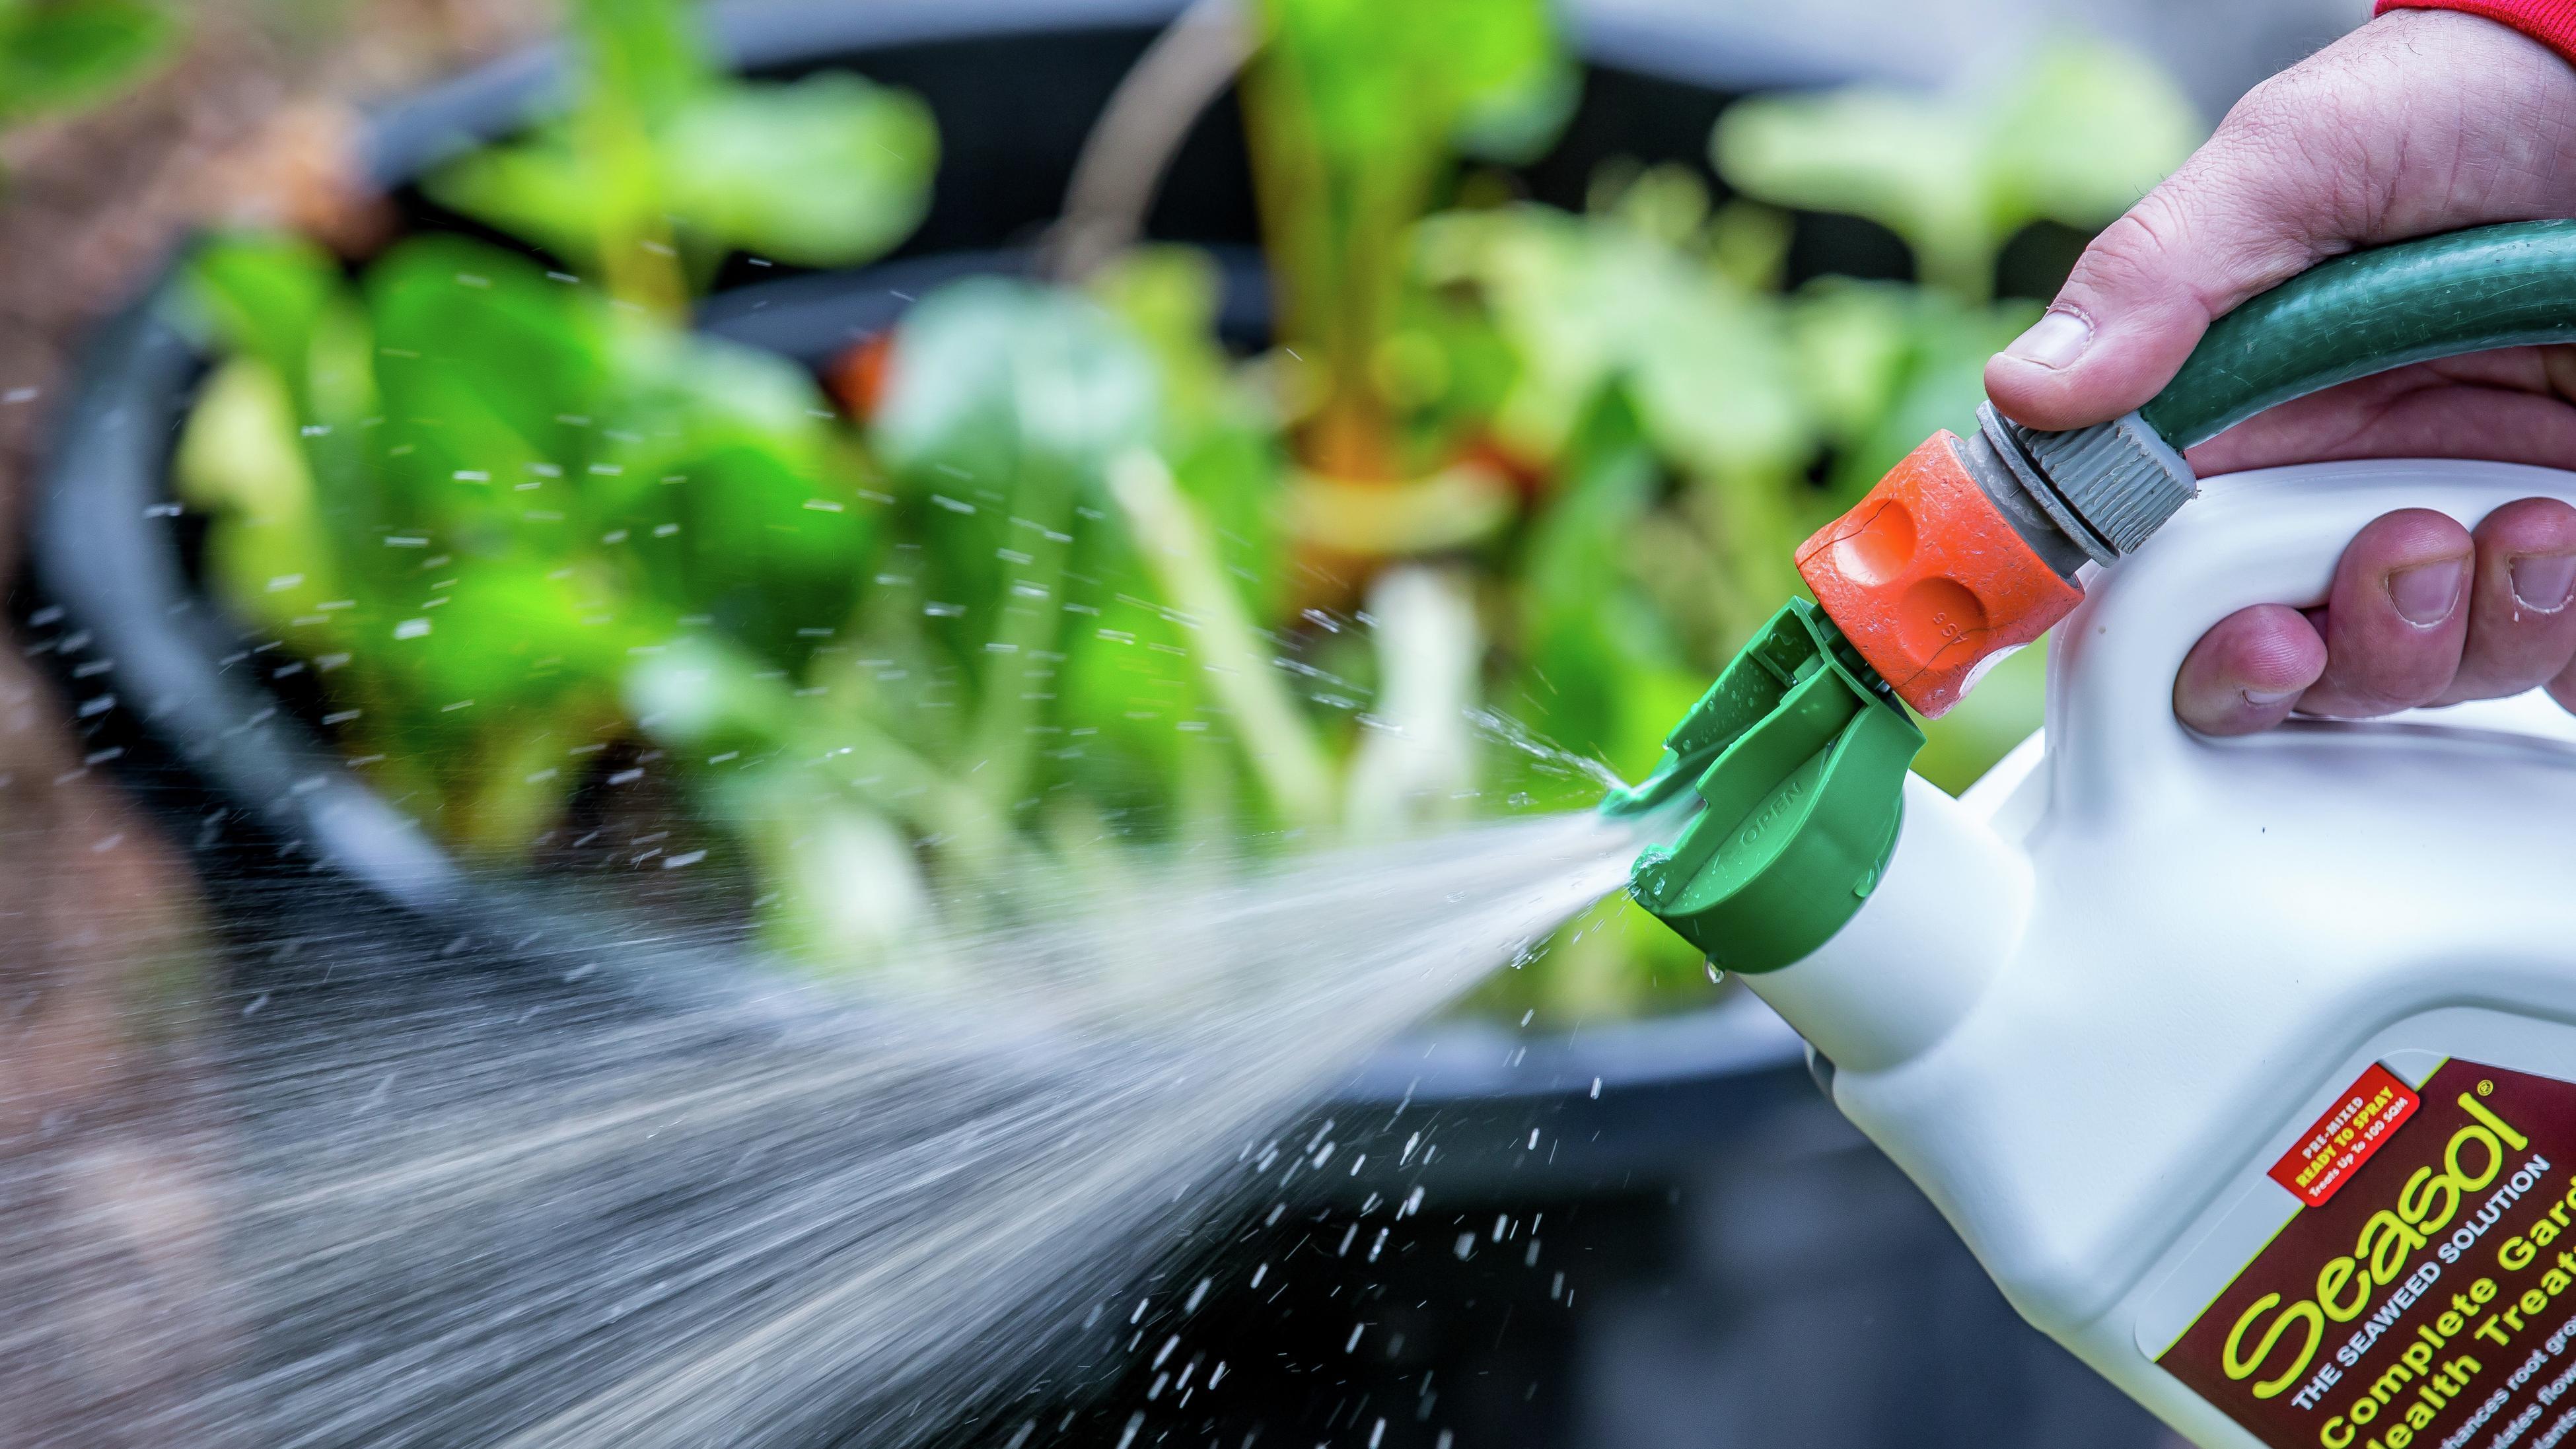 Closeup of person spraying Seasol seaweed solution through a hose attachment